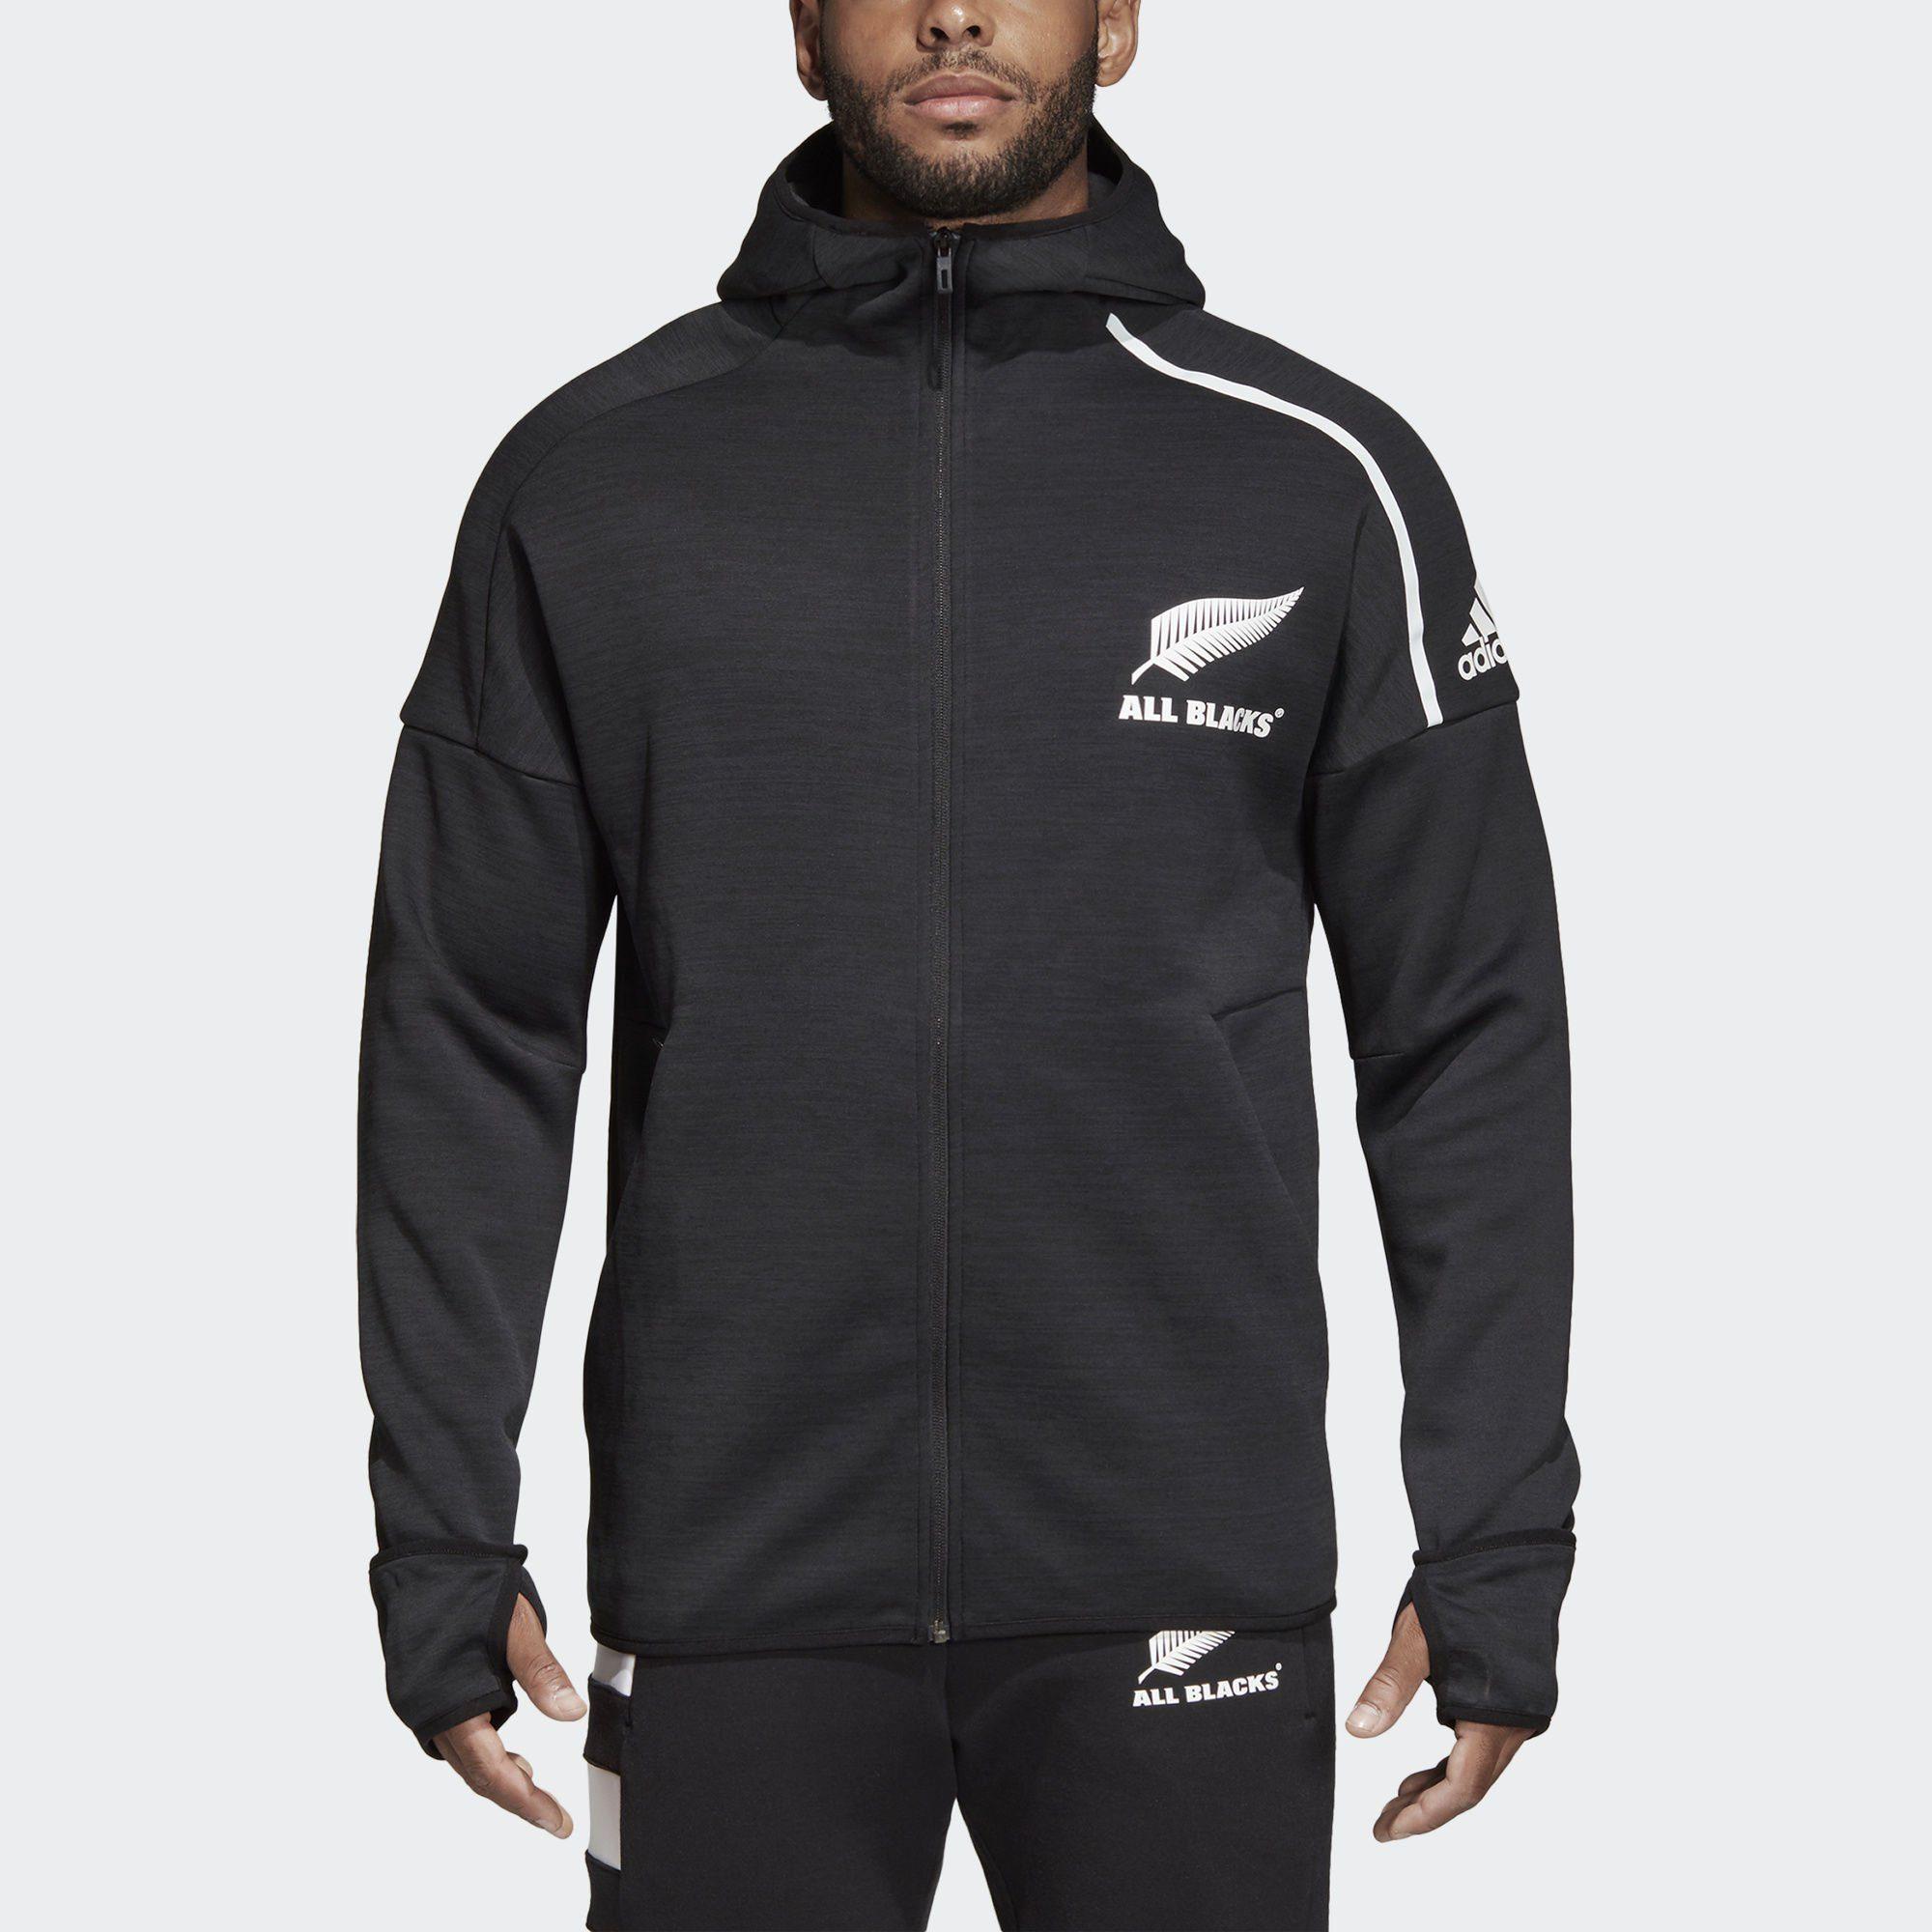 Jacken Adidas Herren Sweatjacke Trainingsjacke Anthem NEU Bekleidung